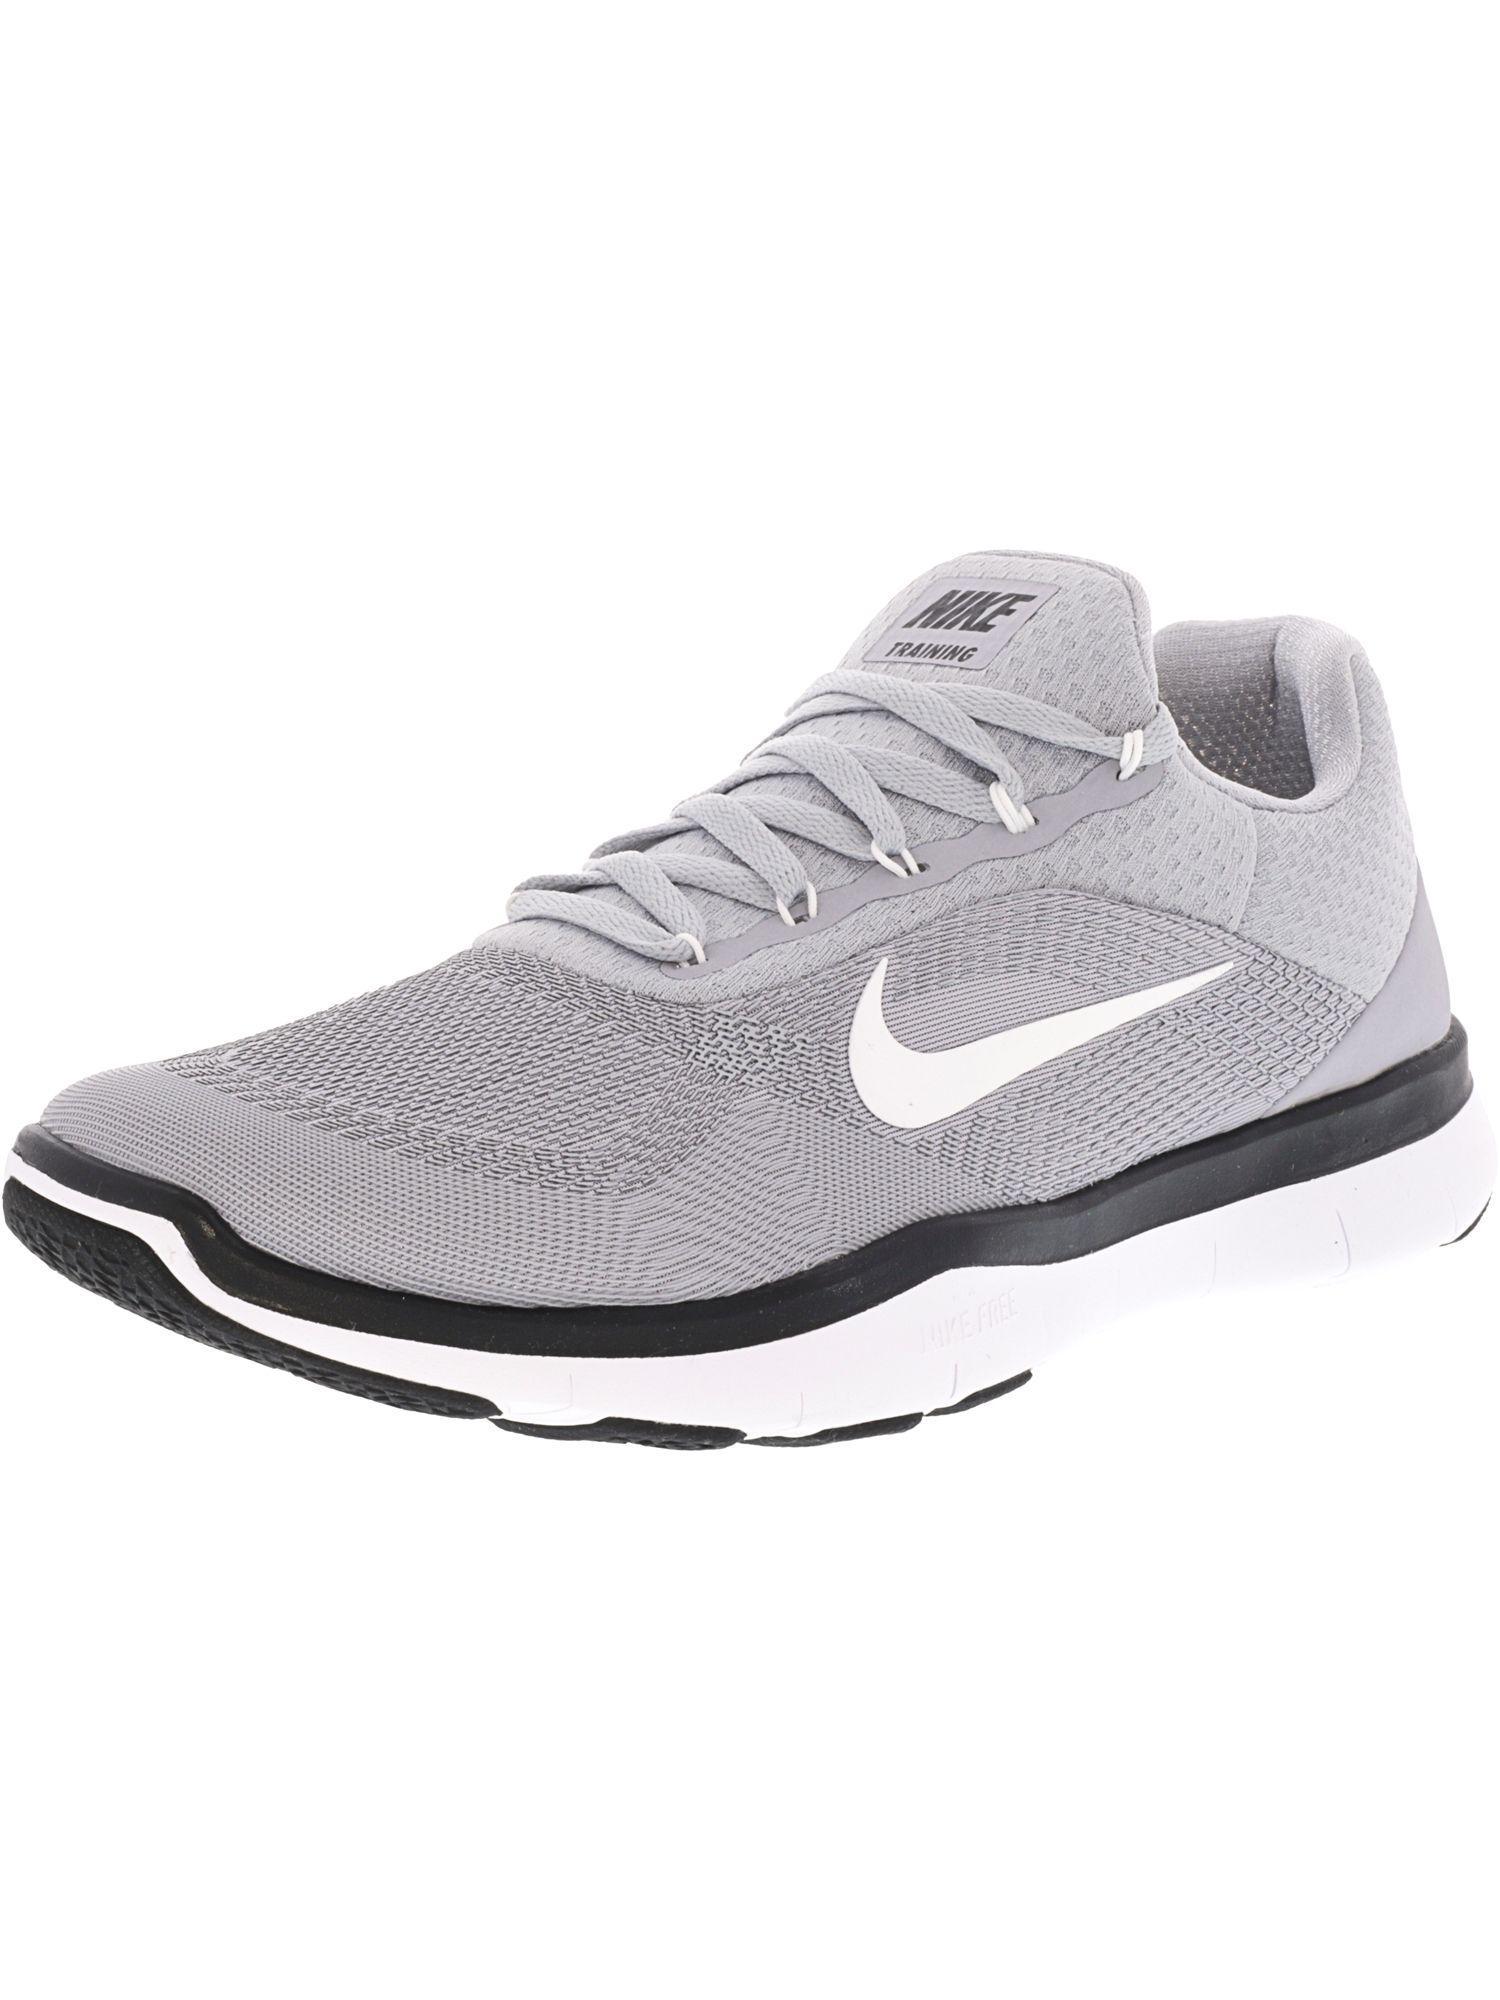 Adapt Womens Nike Running Sneakers Nike Free 7.0 V2 Men Mens